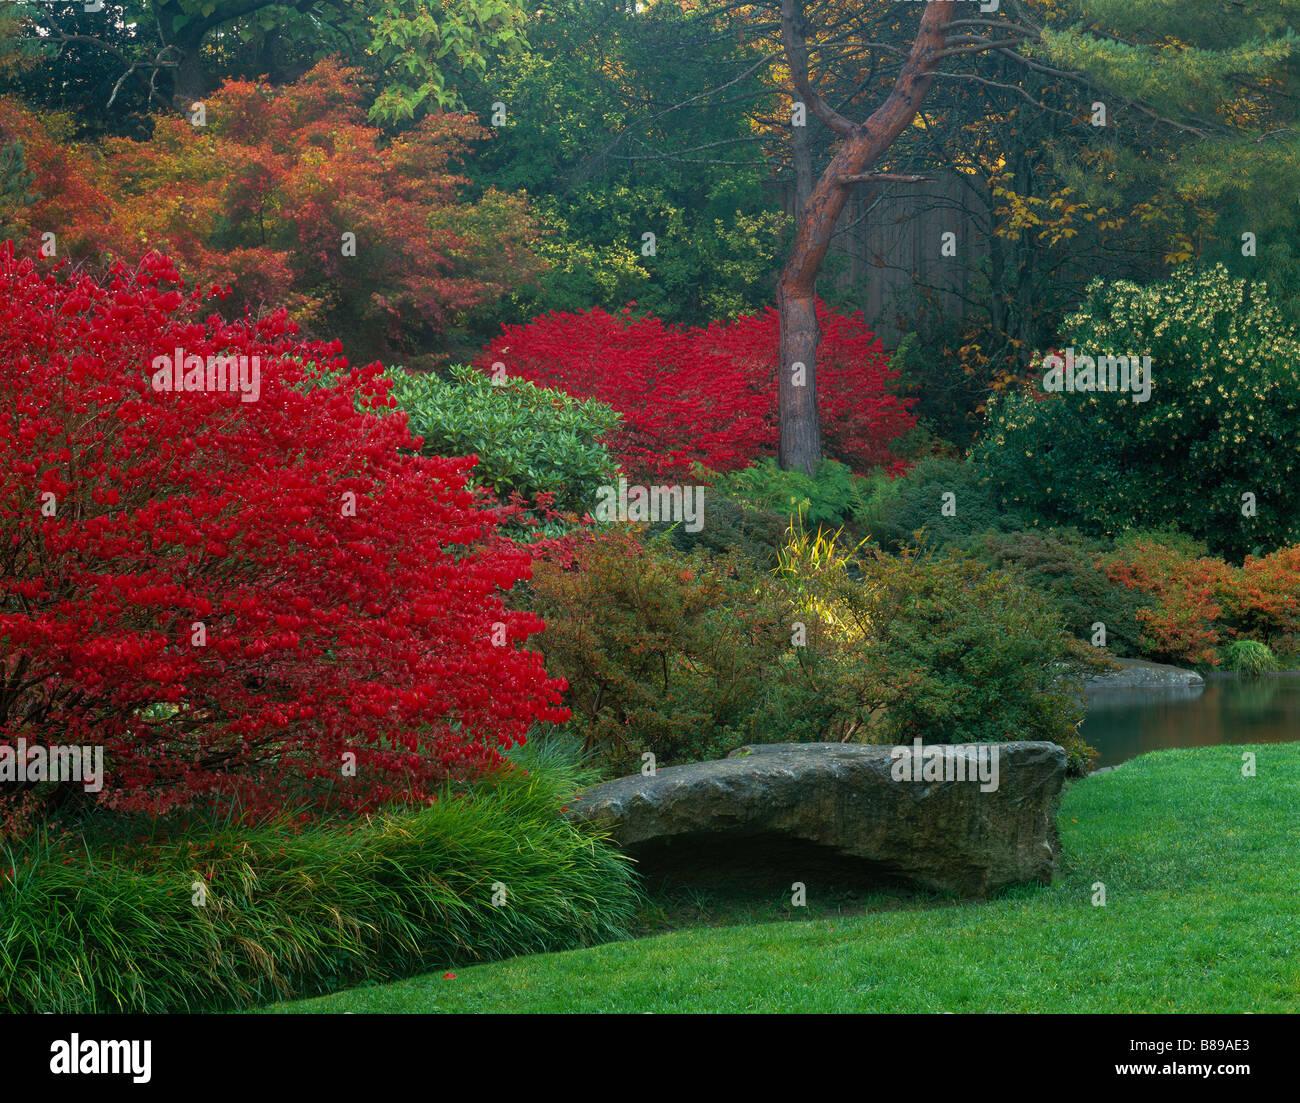 Seattle WA Kubota Gardens Vibrant red autumn leaves of burning